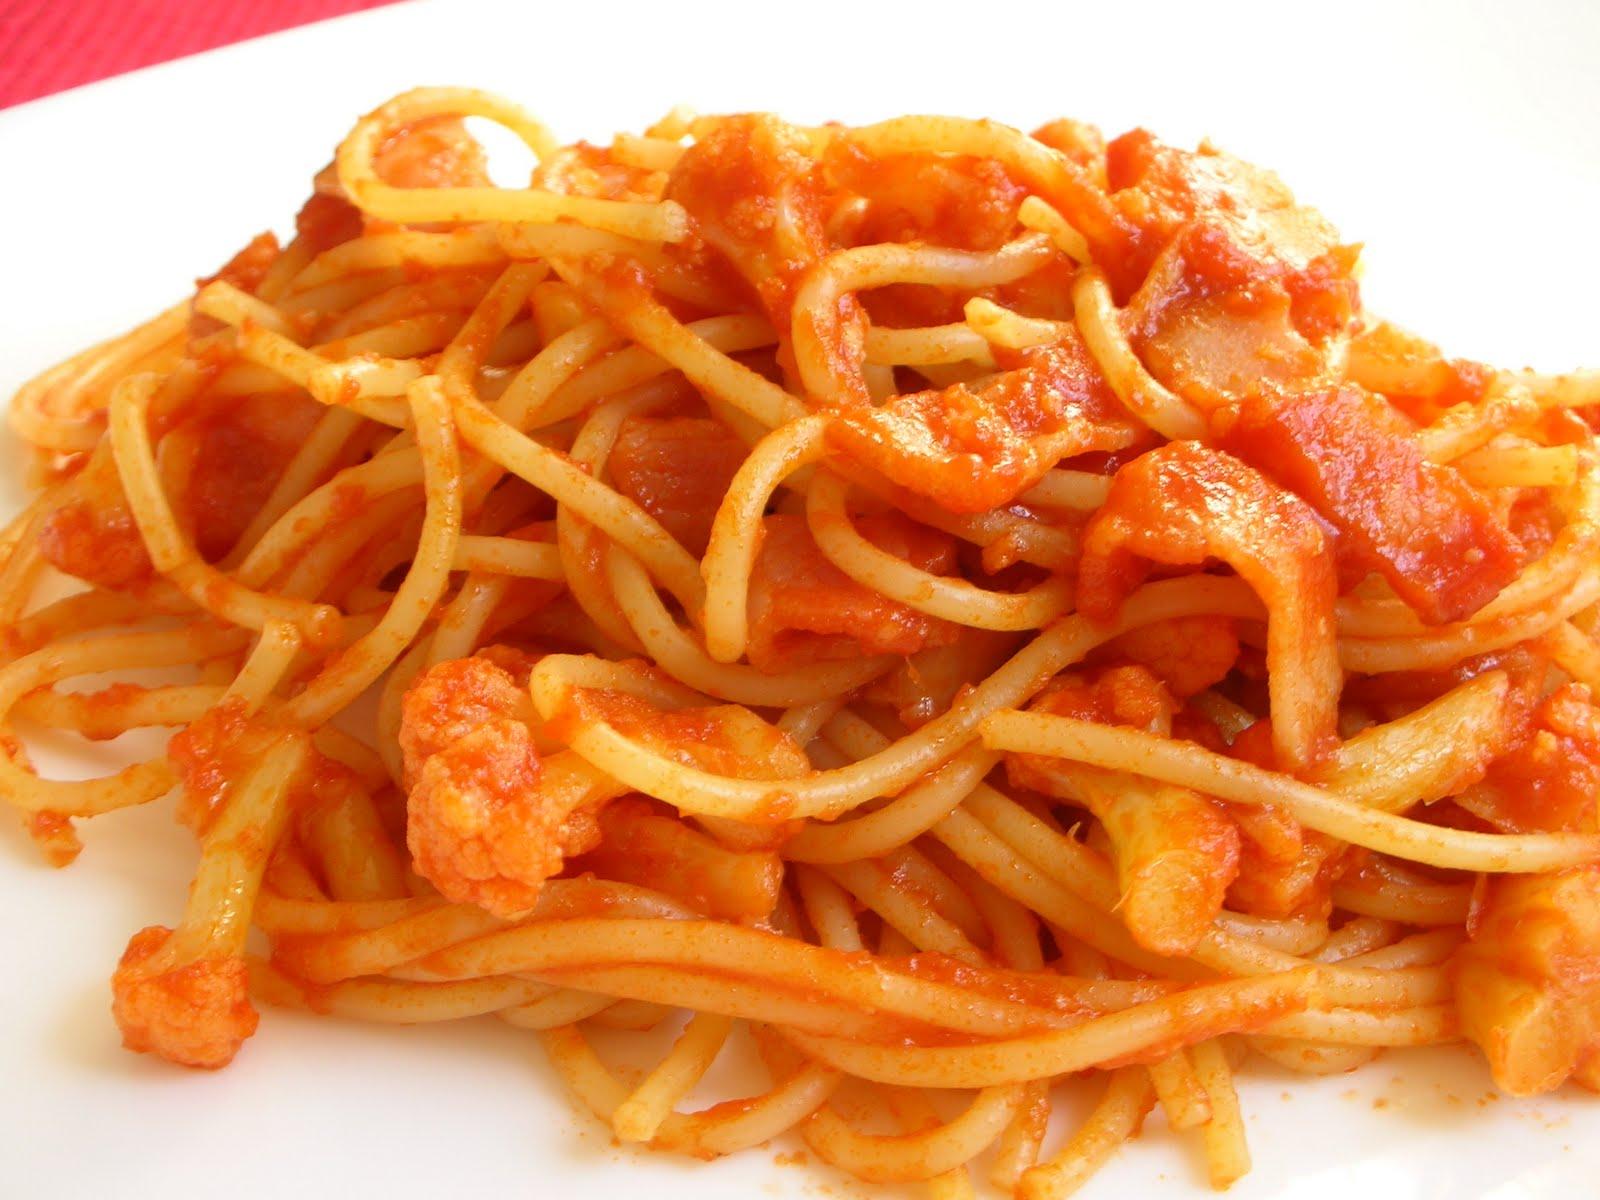 Spaghetti with cauliflower and bacon